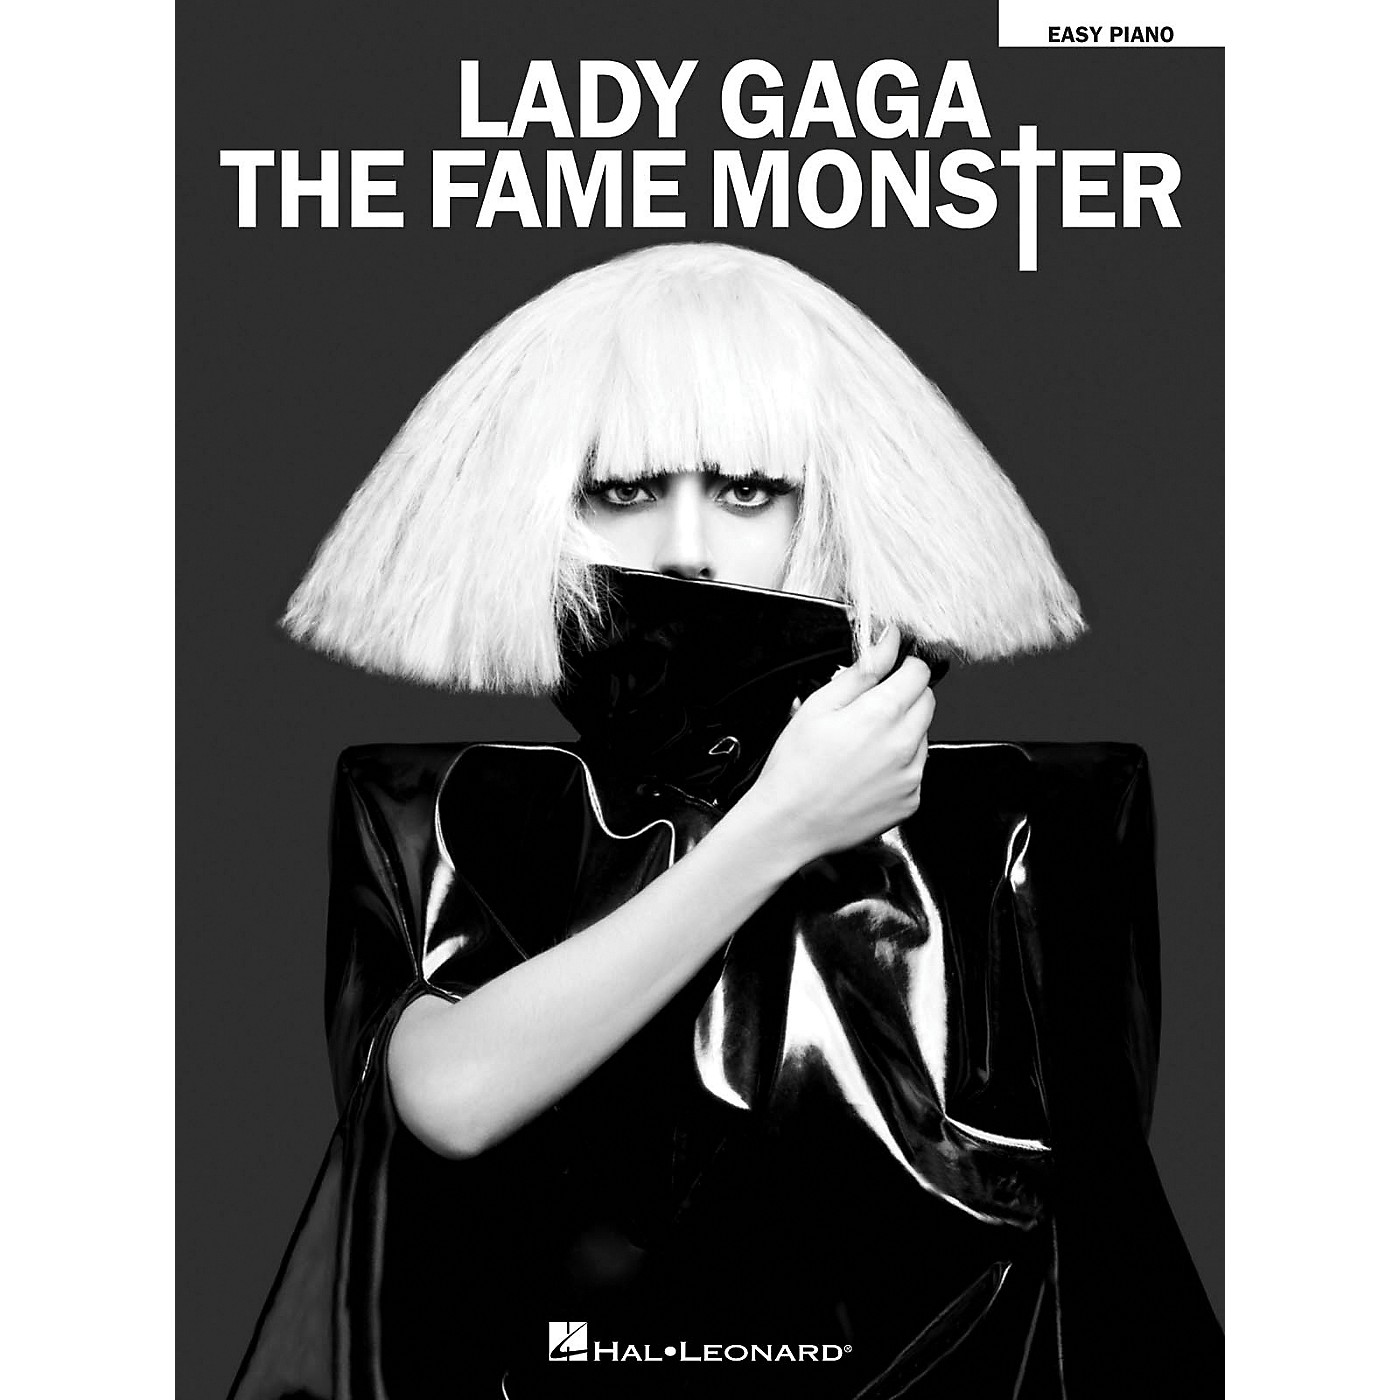 Hal Leonard Lady Gaga - The Fame Monster for Easy Piano thumbnail